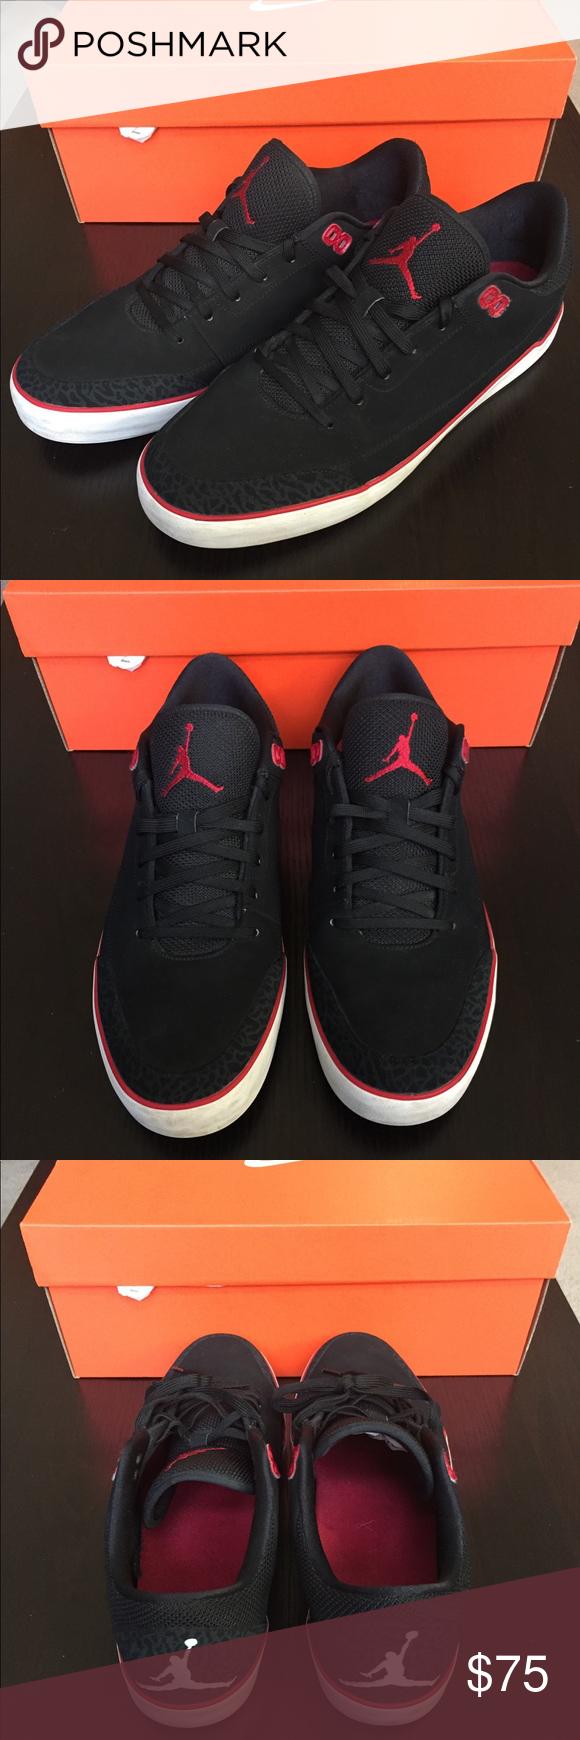 Air Jordan Casual Basketball Shoes Low Top Size 12 Brand: Air ...